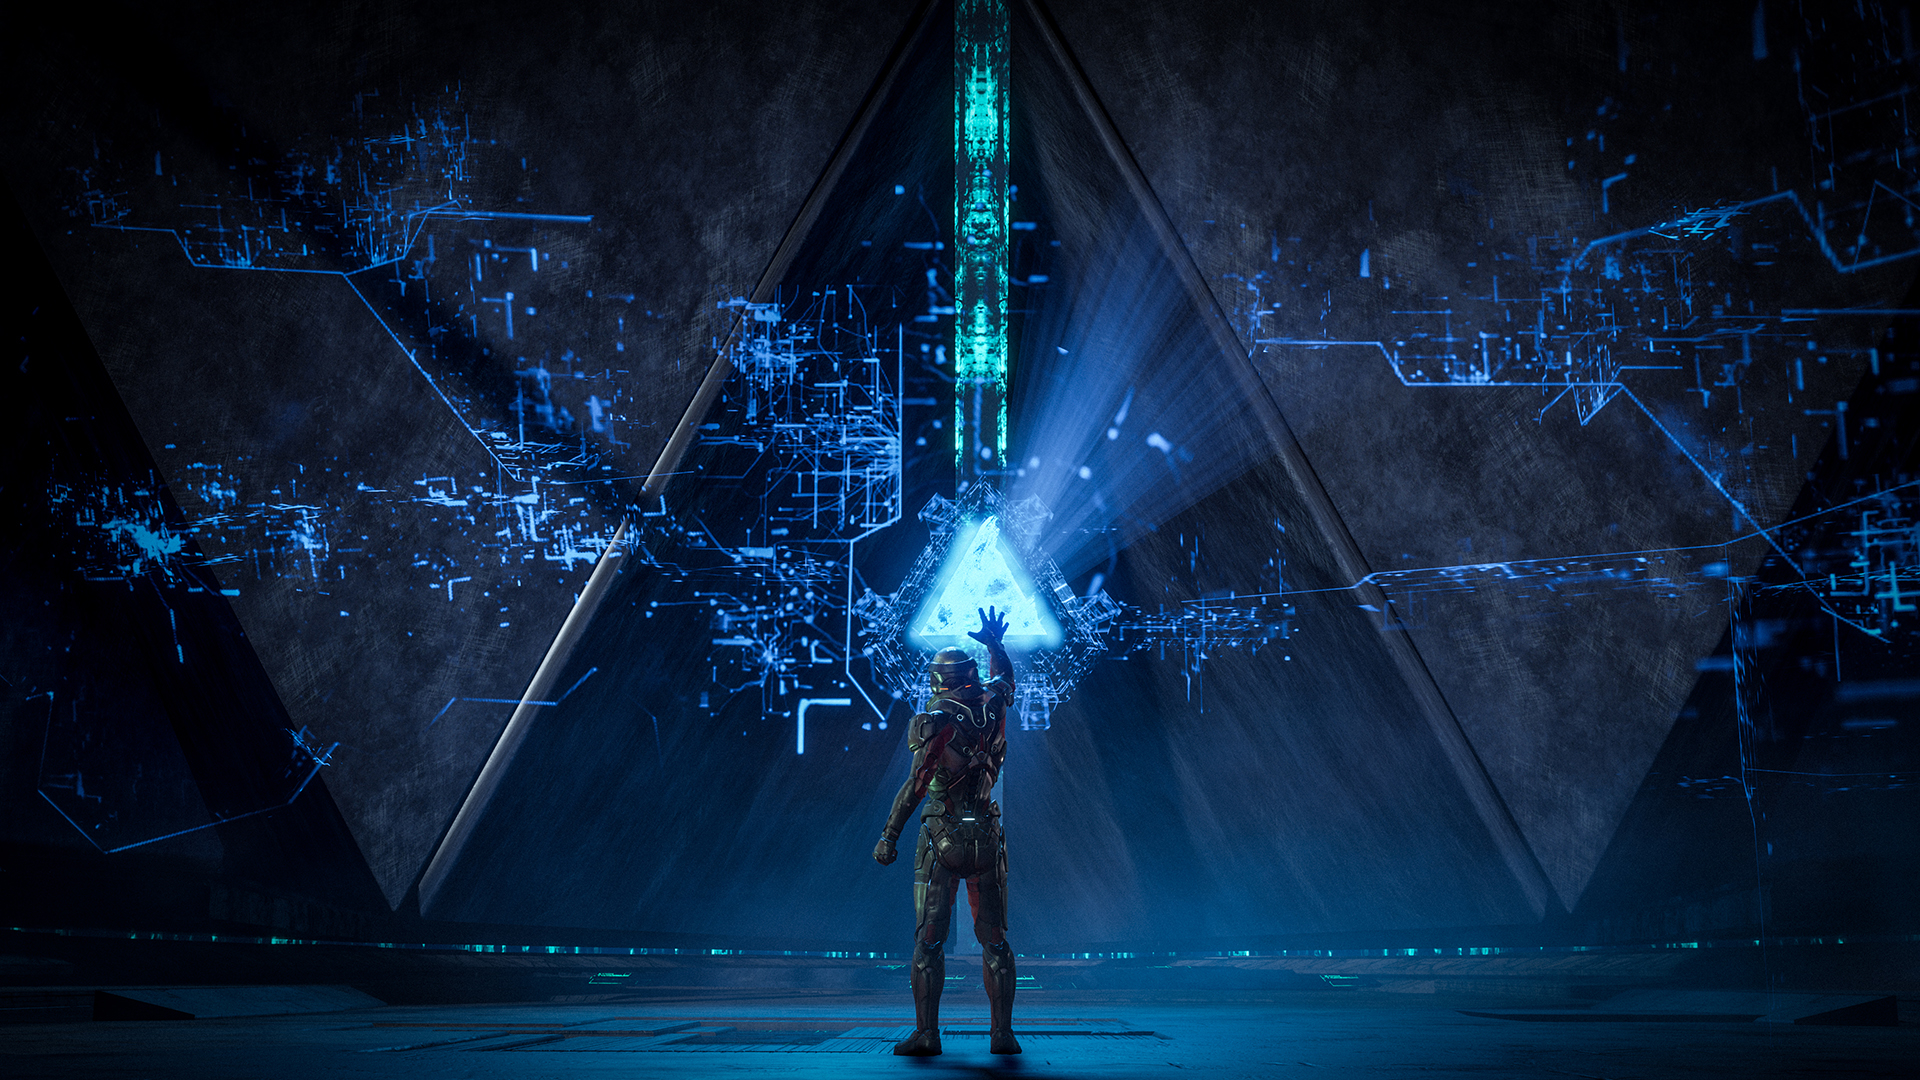 Mass Effect Andromeda 2019 Wallpaper Hd Games 4k Wallpapers Images